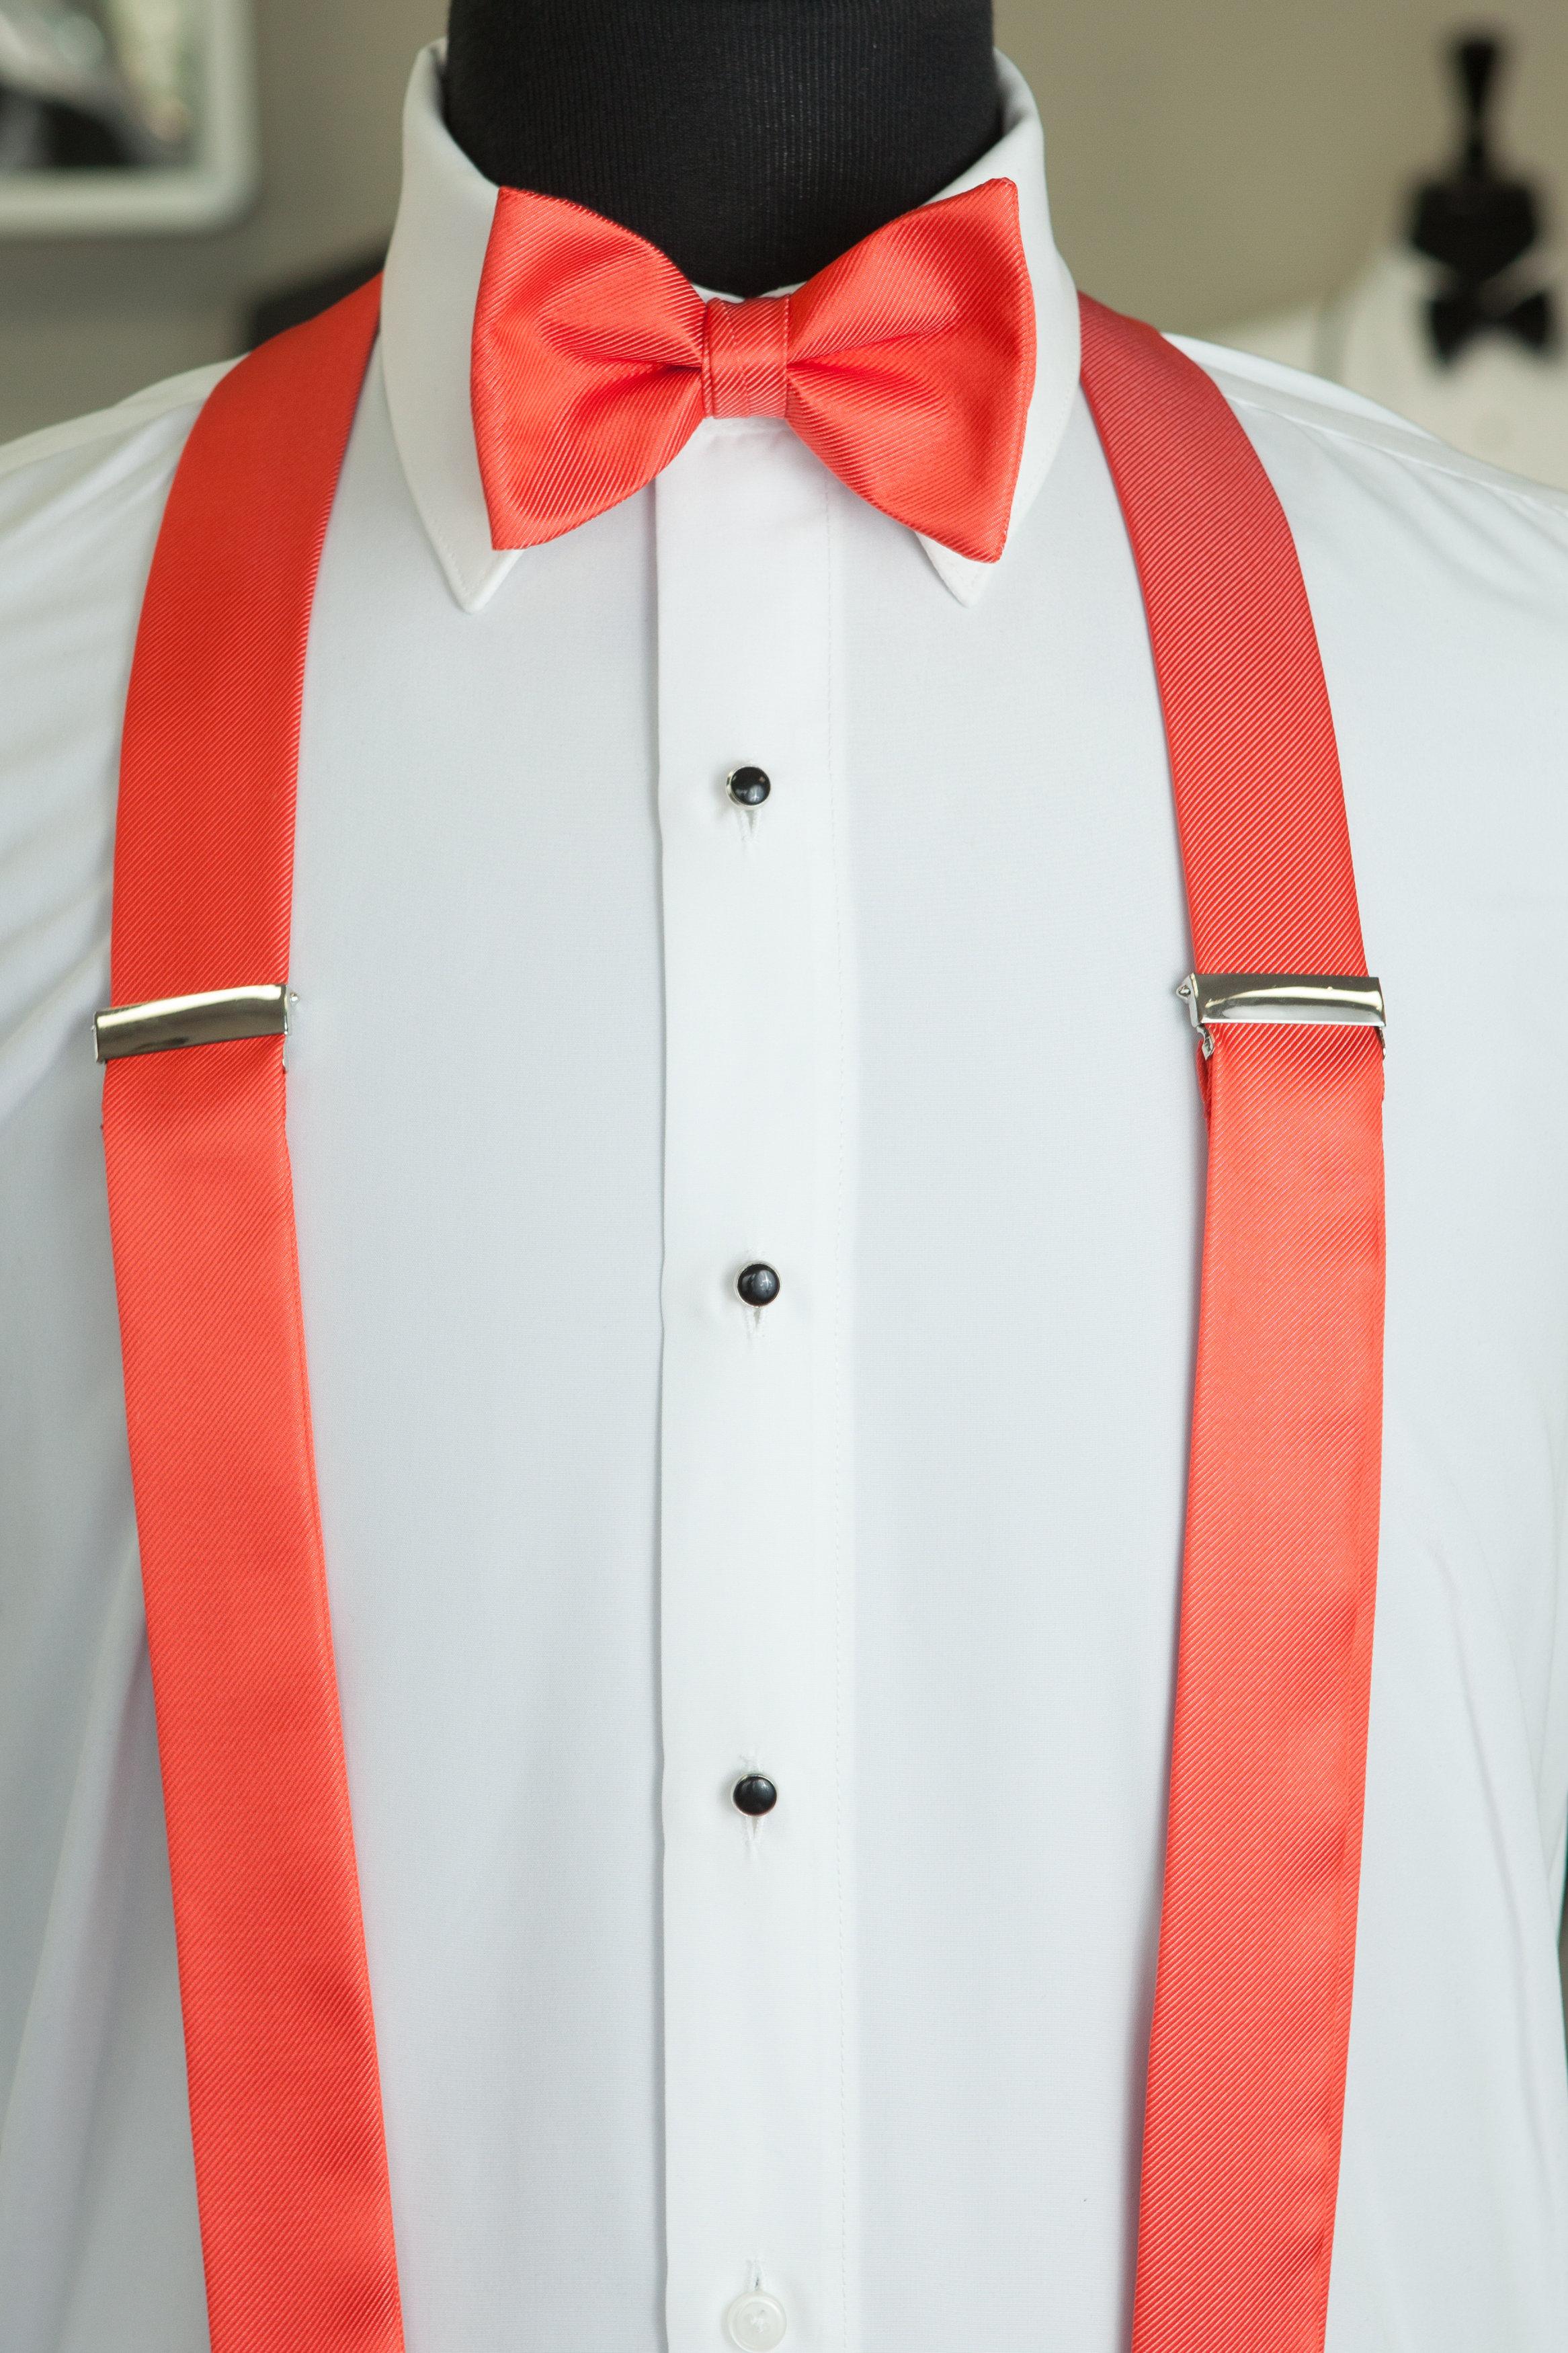 sun coral suspenders classic tuxedos suits